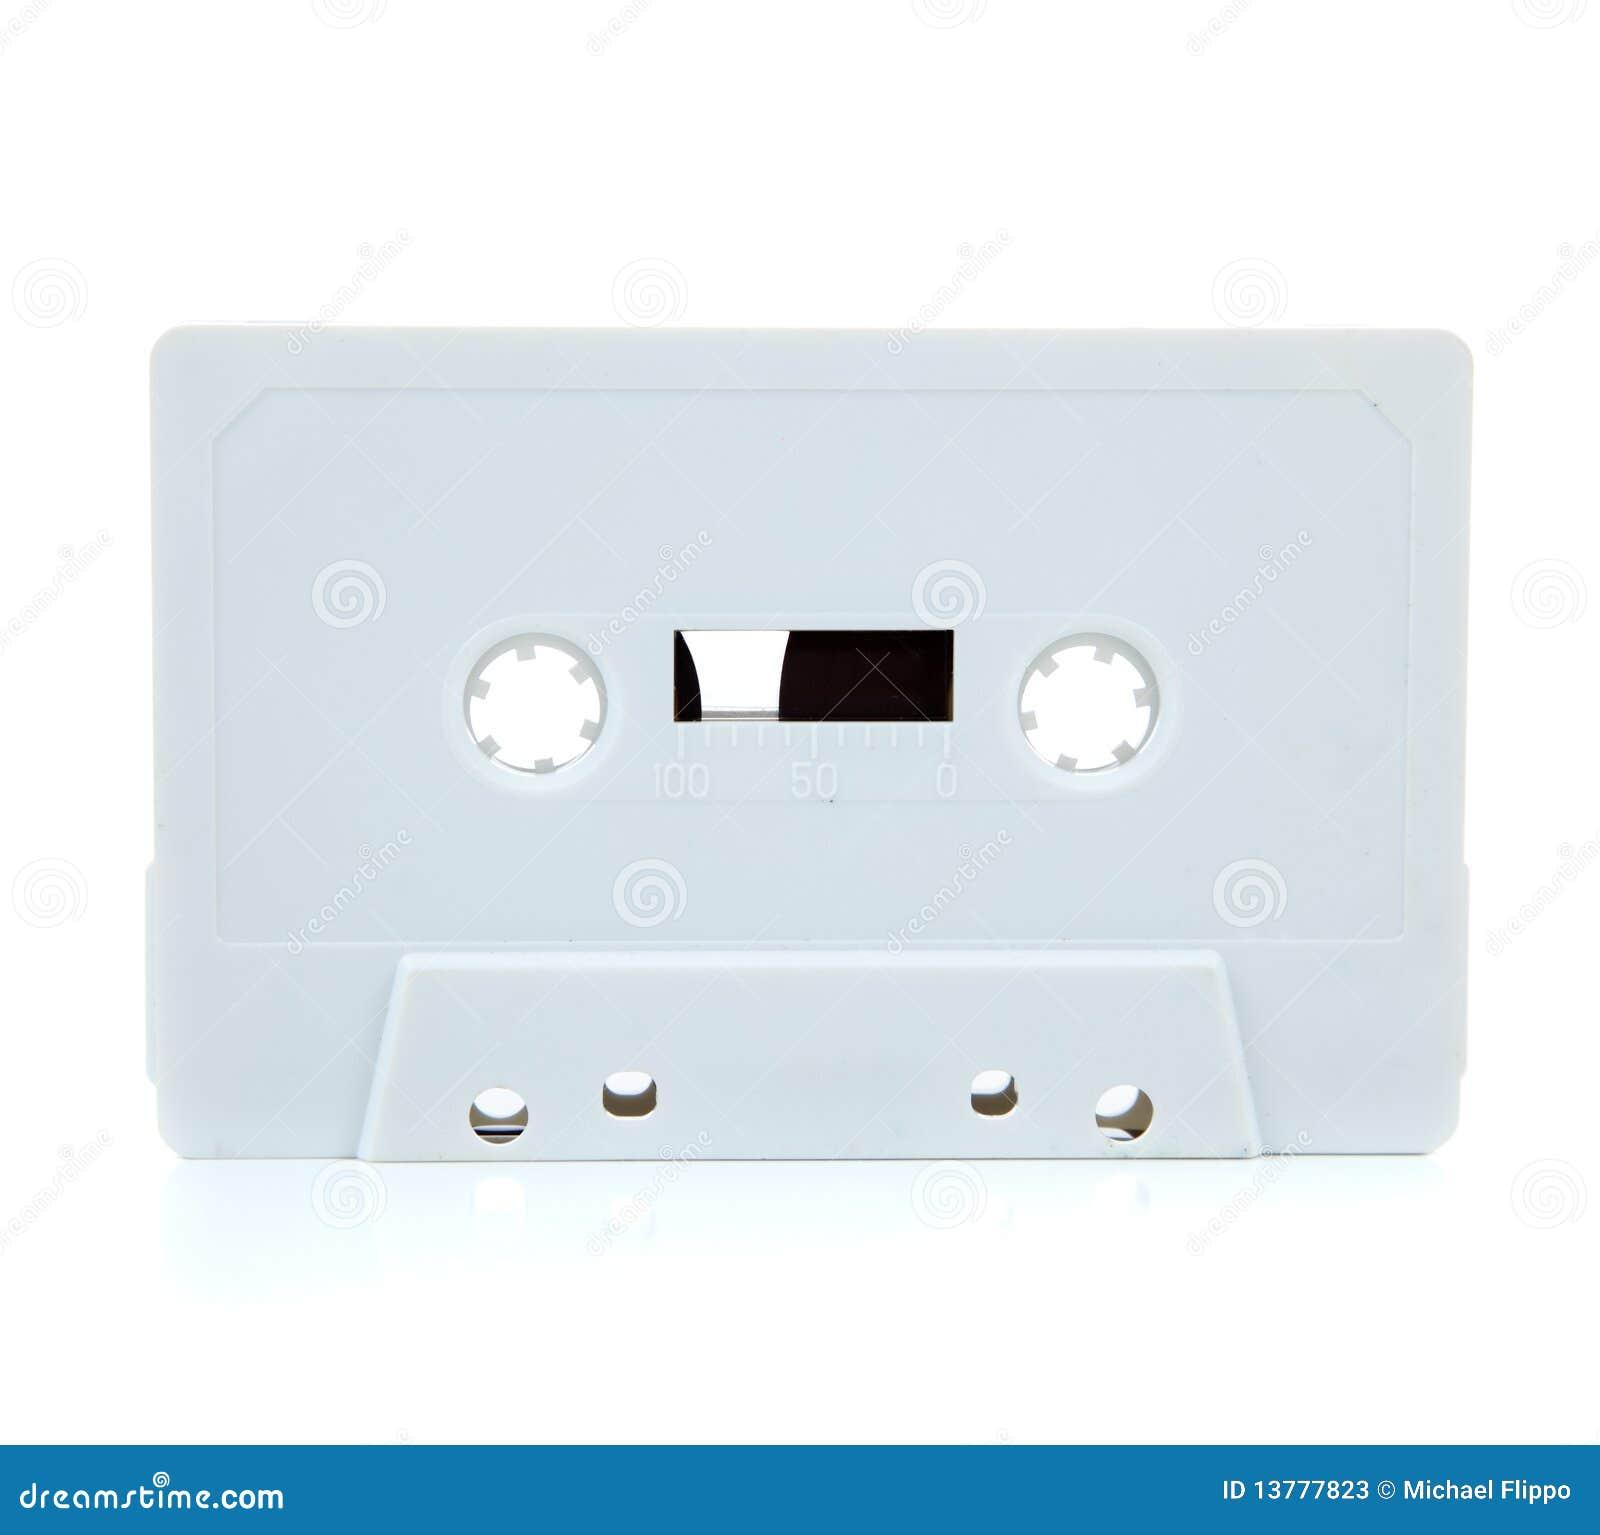 white blank cassette on white stock image image of stereo magnetic 13777823. Black Bedroom Furniture Sets. Home Design Ideas